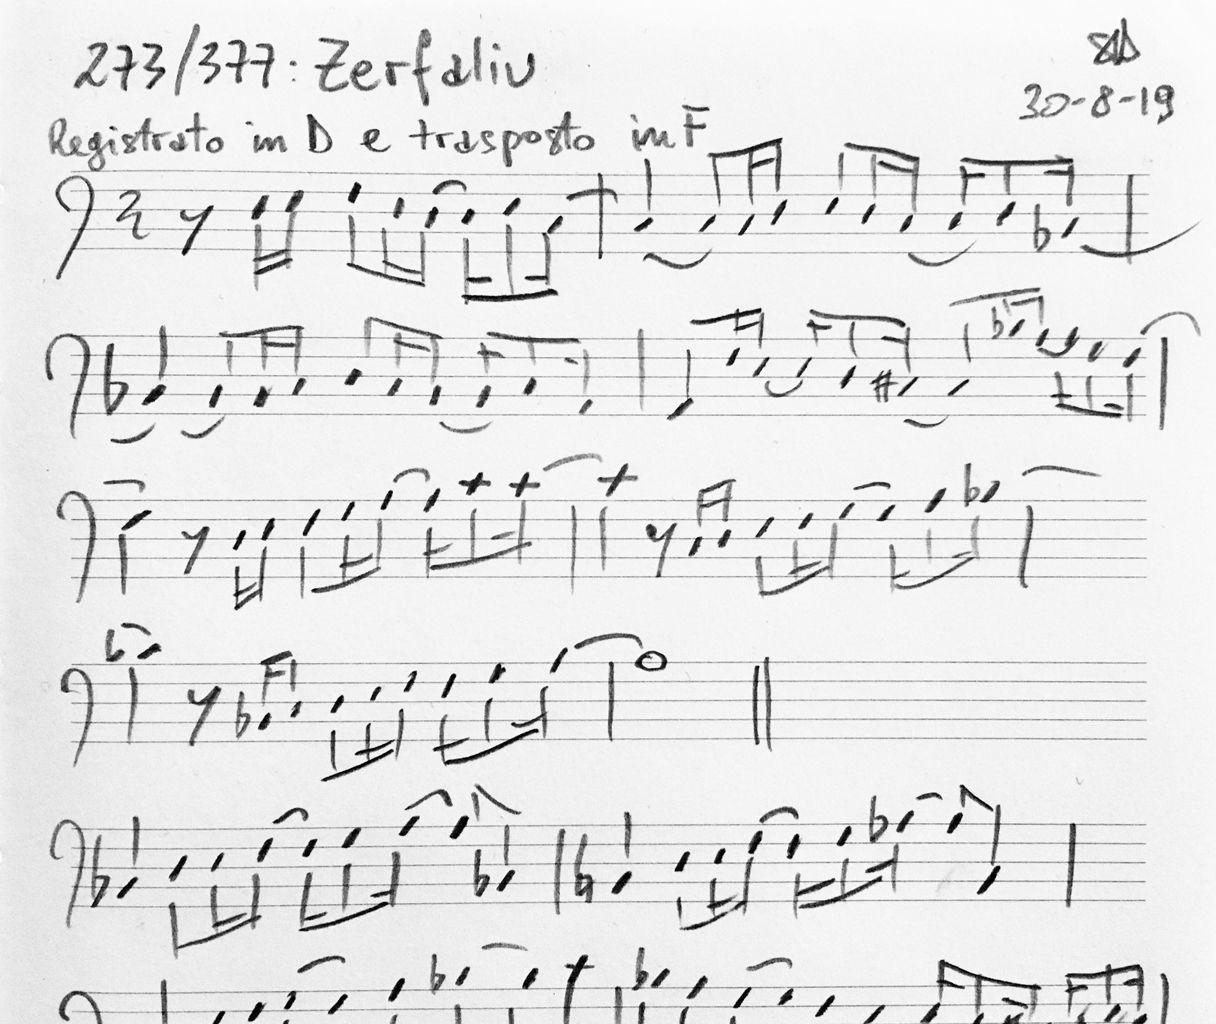 273-Zerfaliu-score